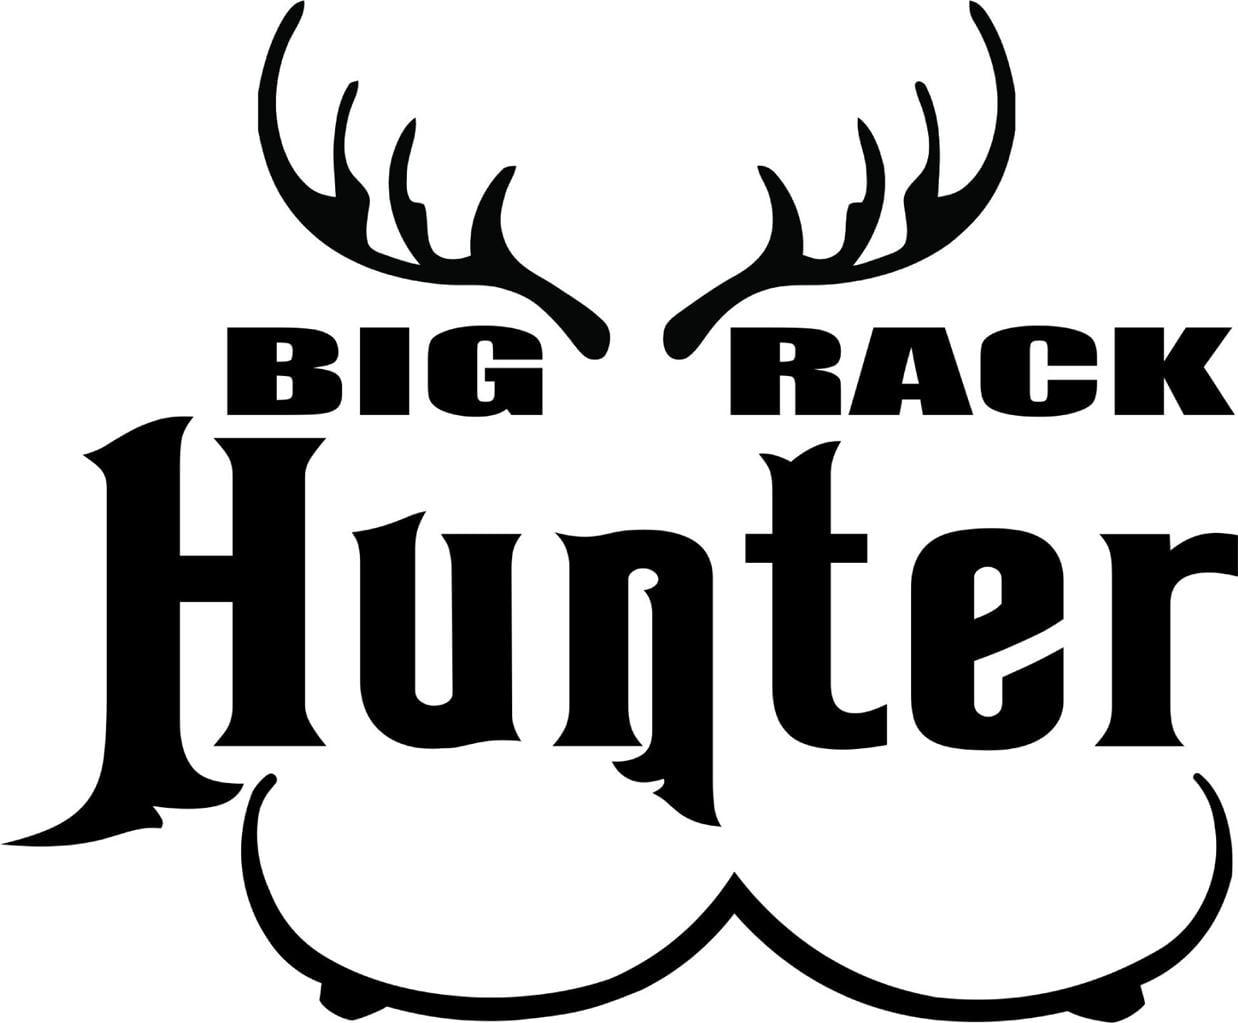 Custom Wall Decal Deer Buck Rack Animal Hunting Hunter Man Gun picture Art Boys Kids Sticker Vinyl Wall Decal 14 X 14... by Design With Vinyl